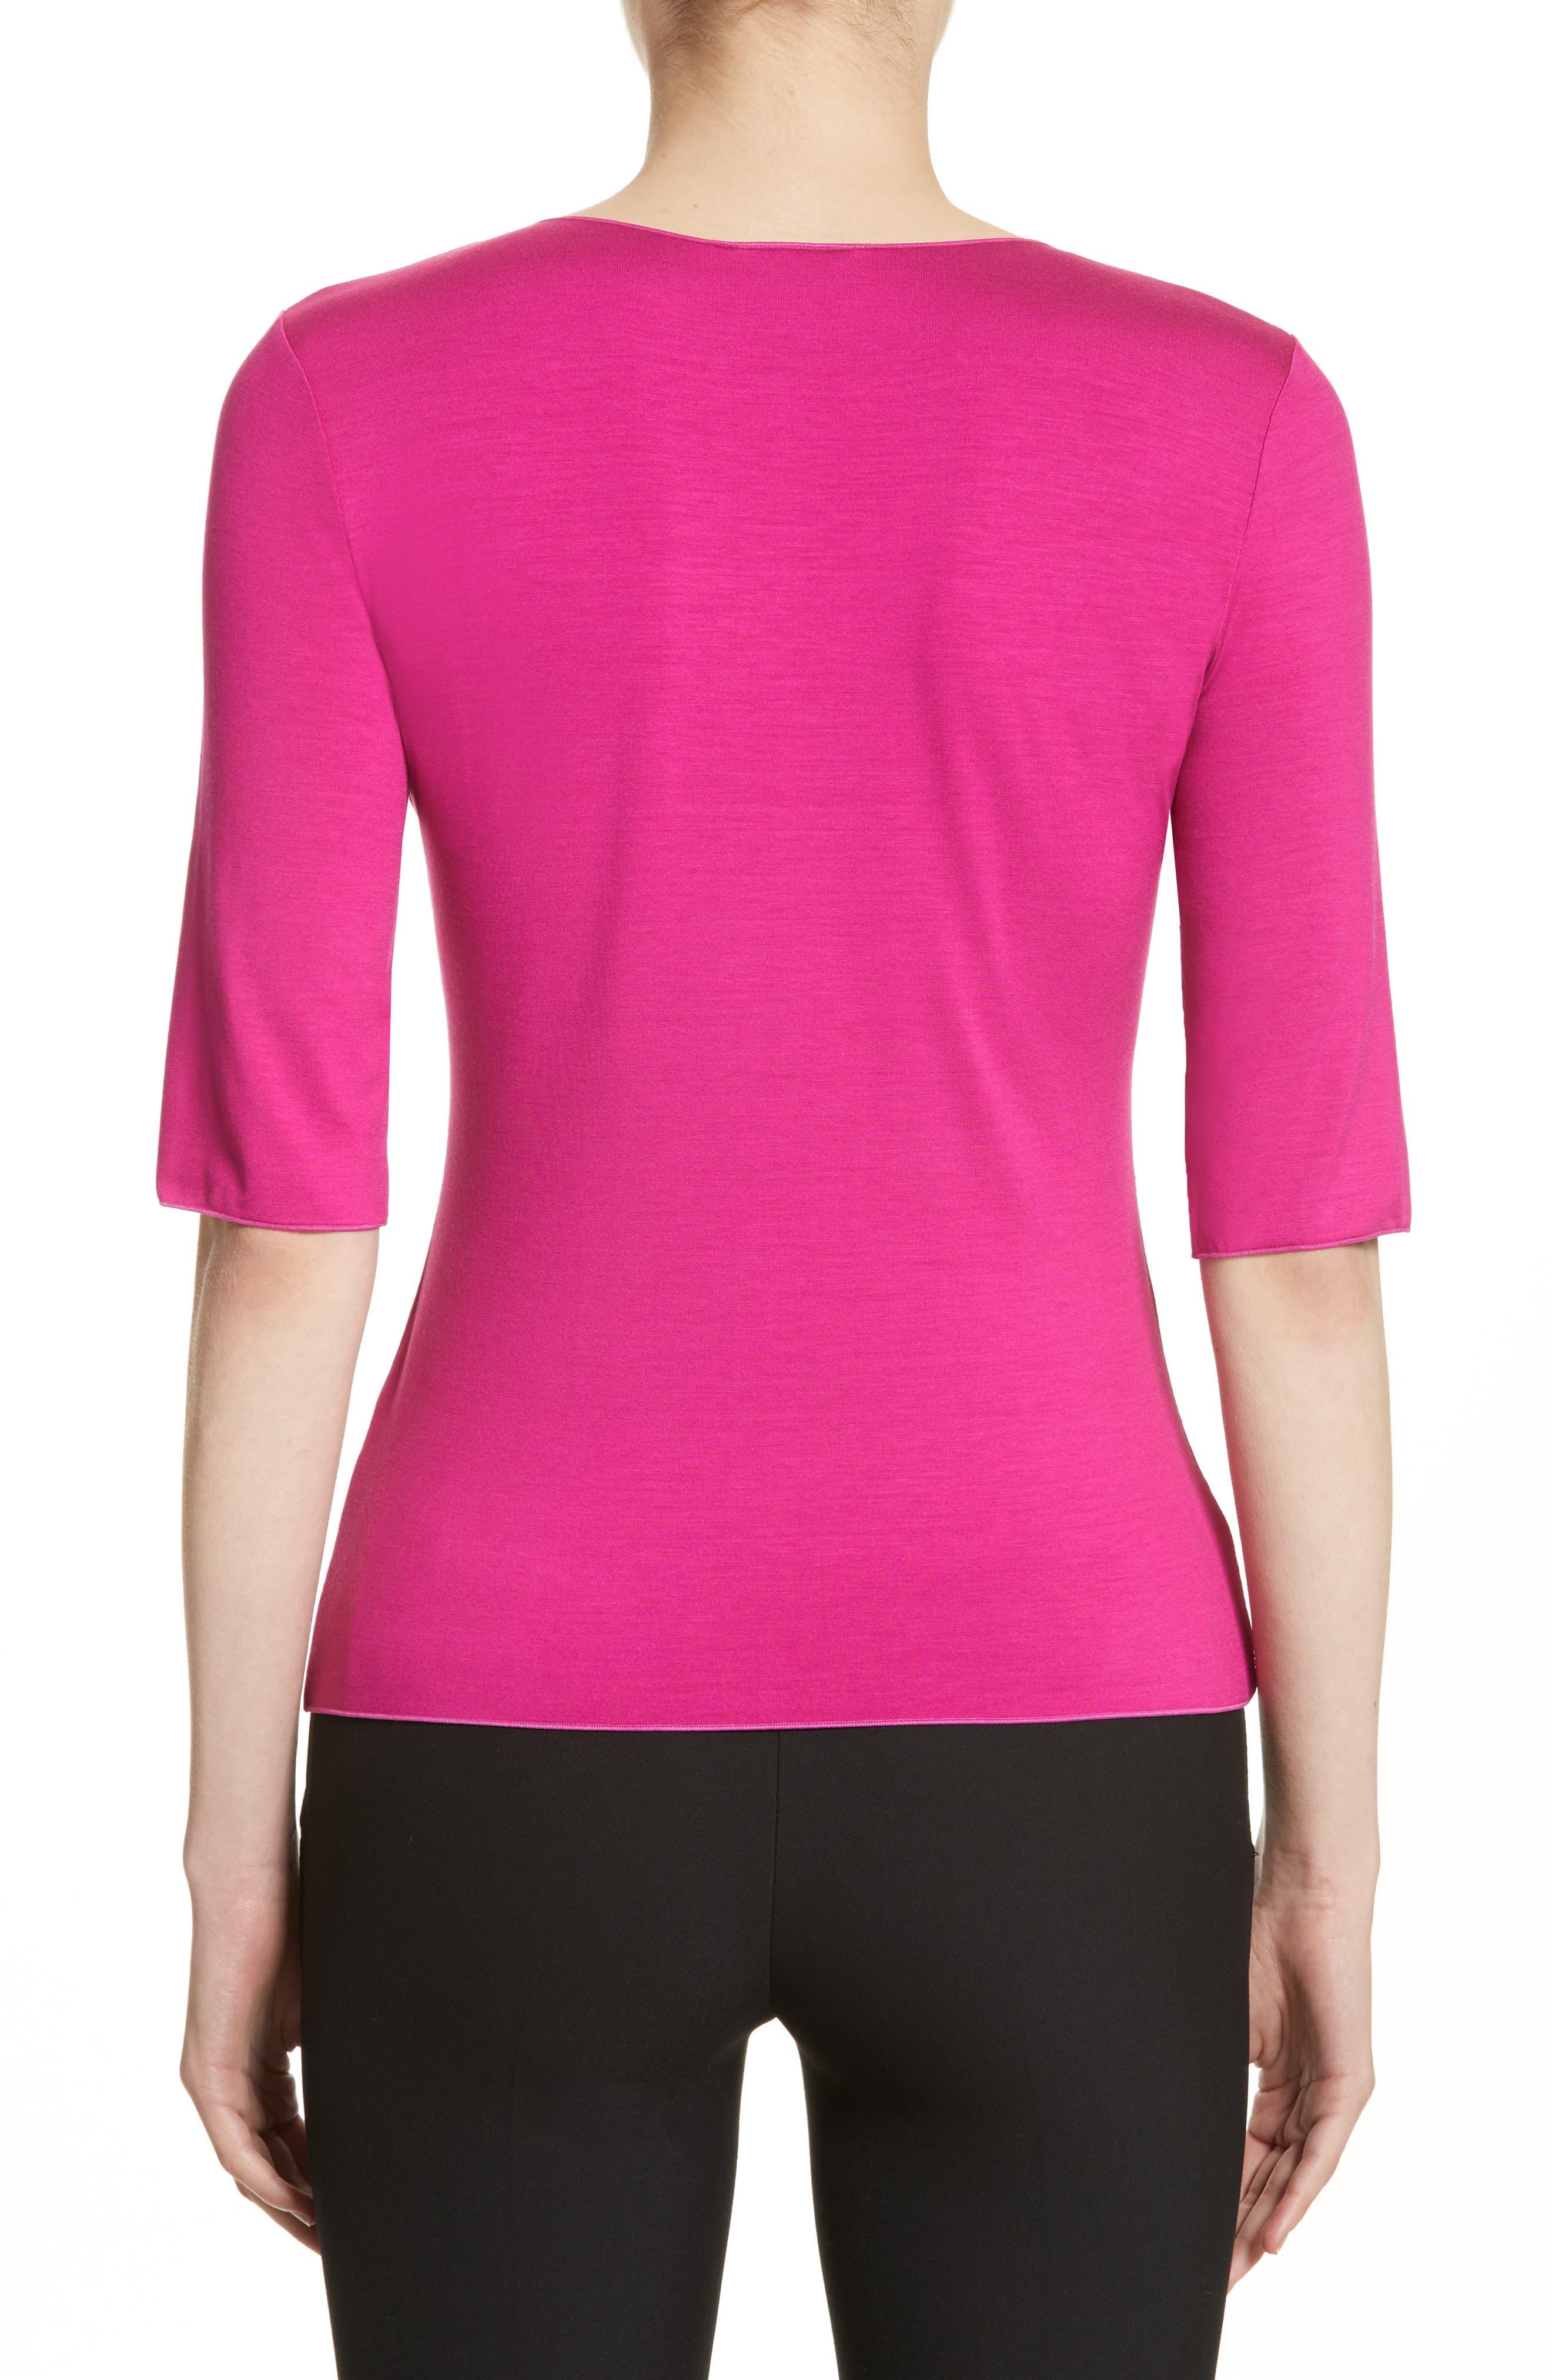 Alternate Image 2  - Armani Collezioni Stretch Jersey Top